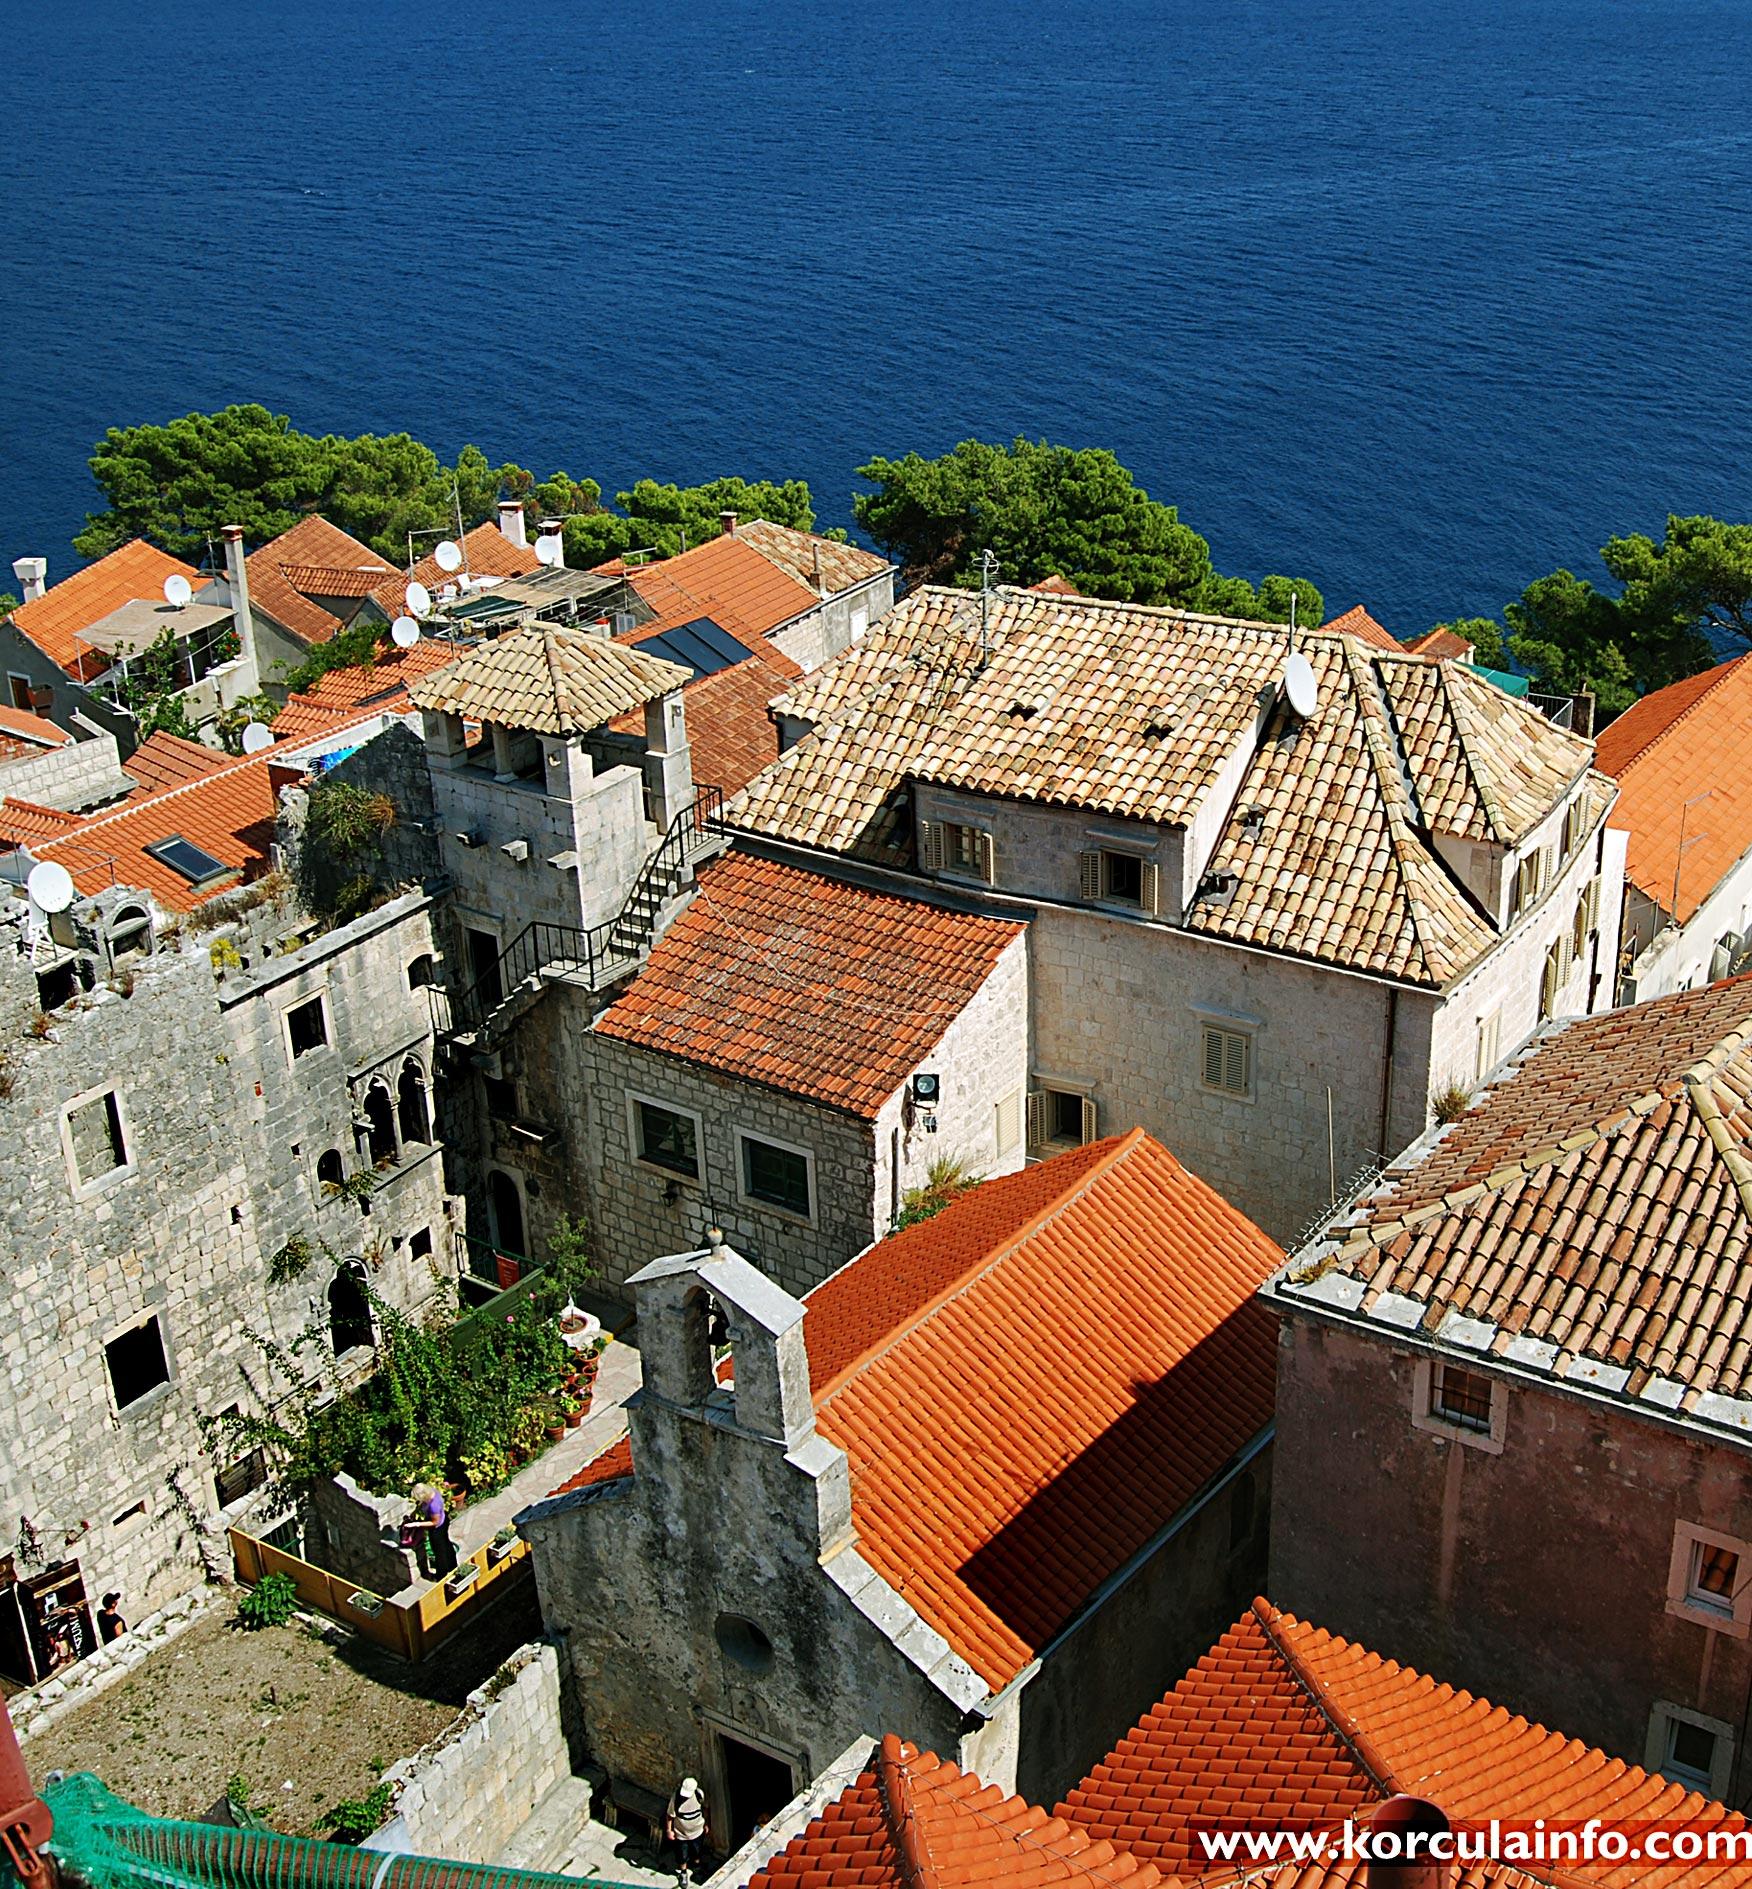 Views over Marco Polo House, Church Sveti Petar and Lesic - Dimitri Palace